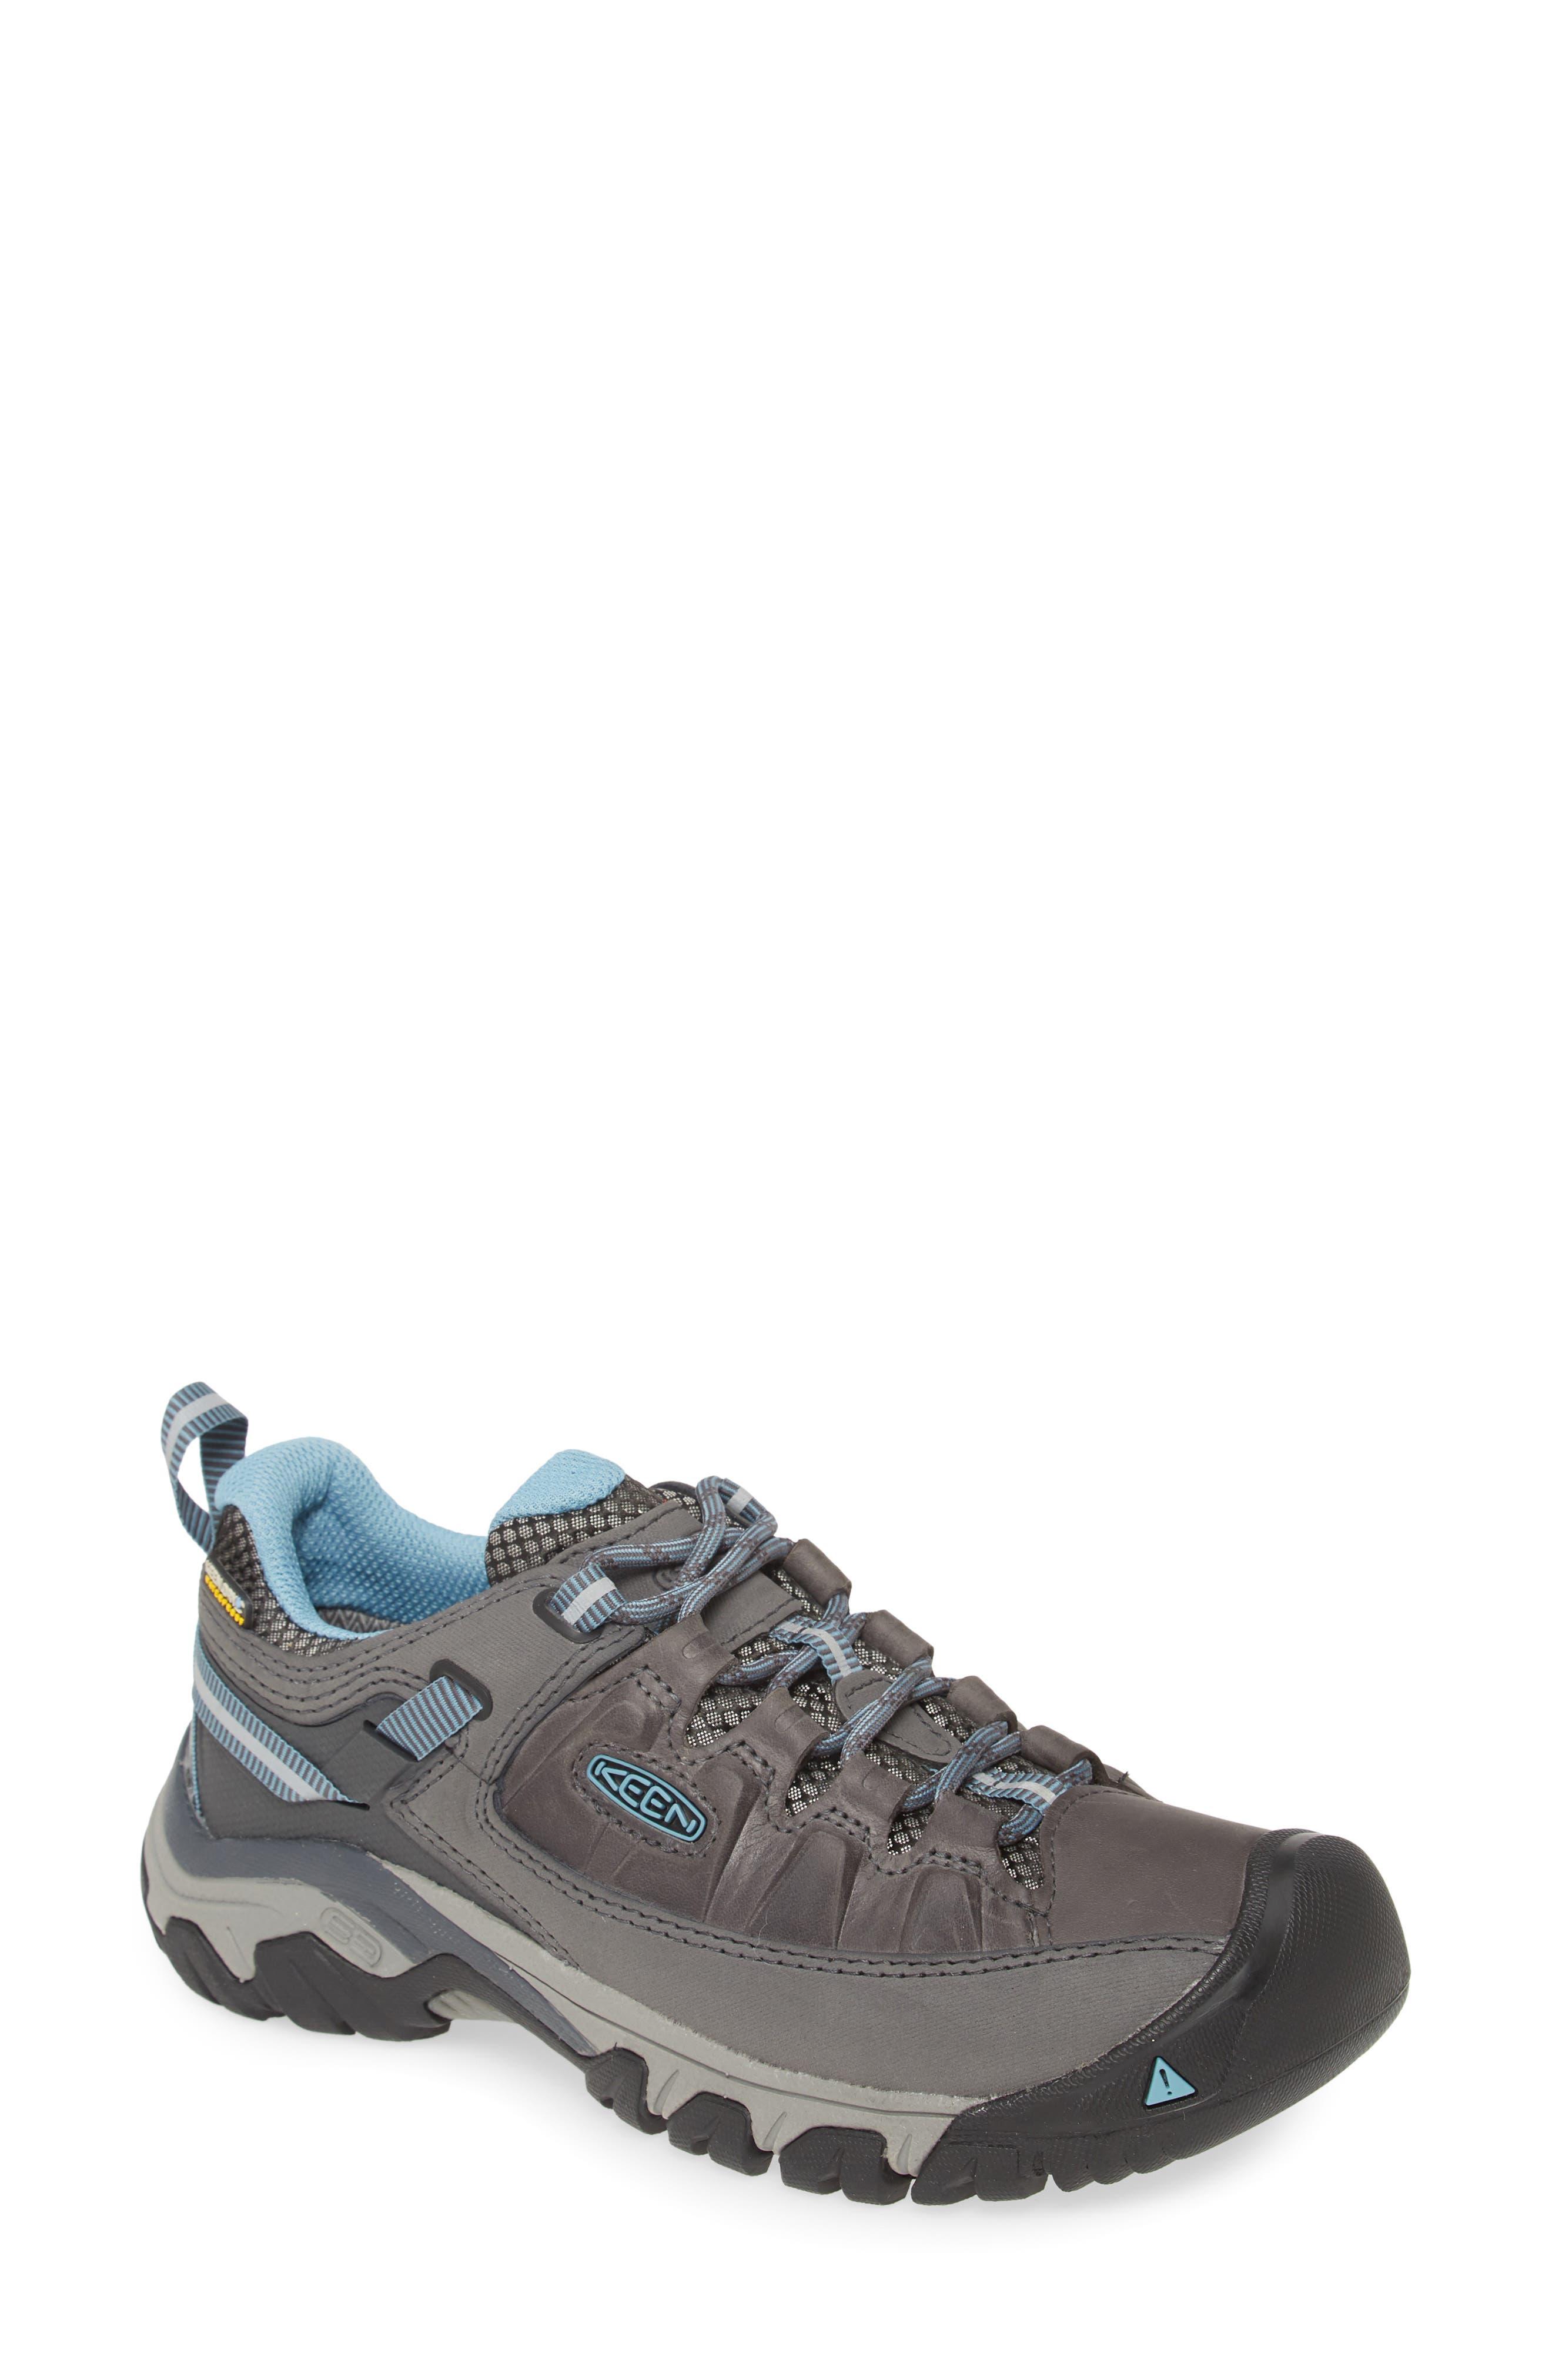 Targhee Iii Waterproof Hiking Shoe